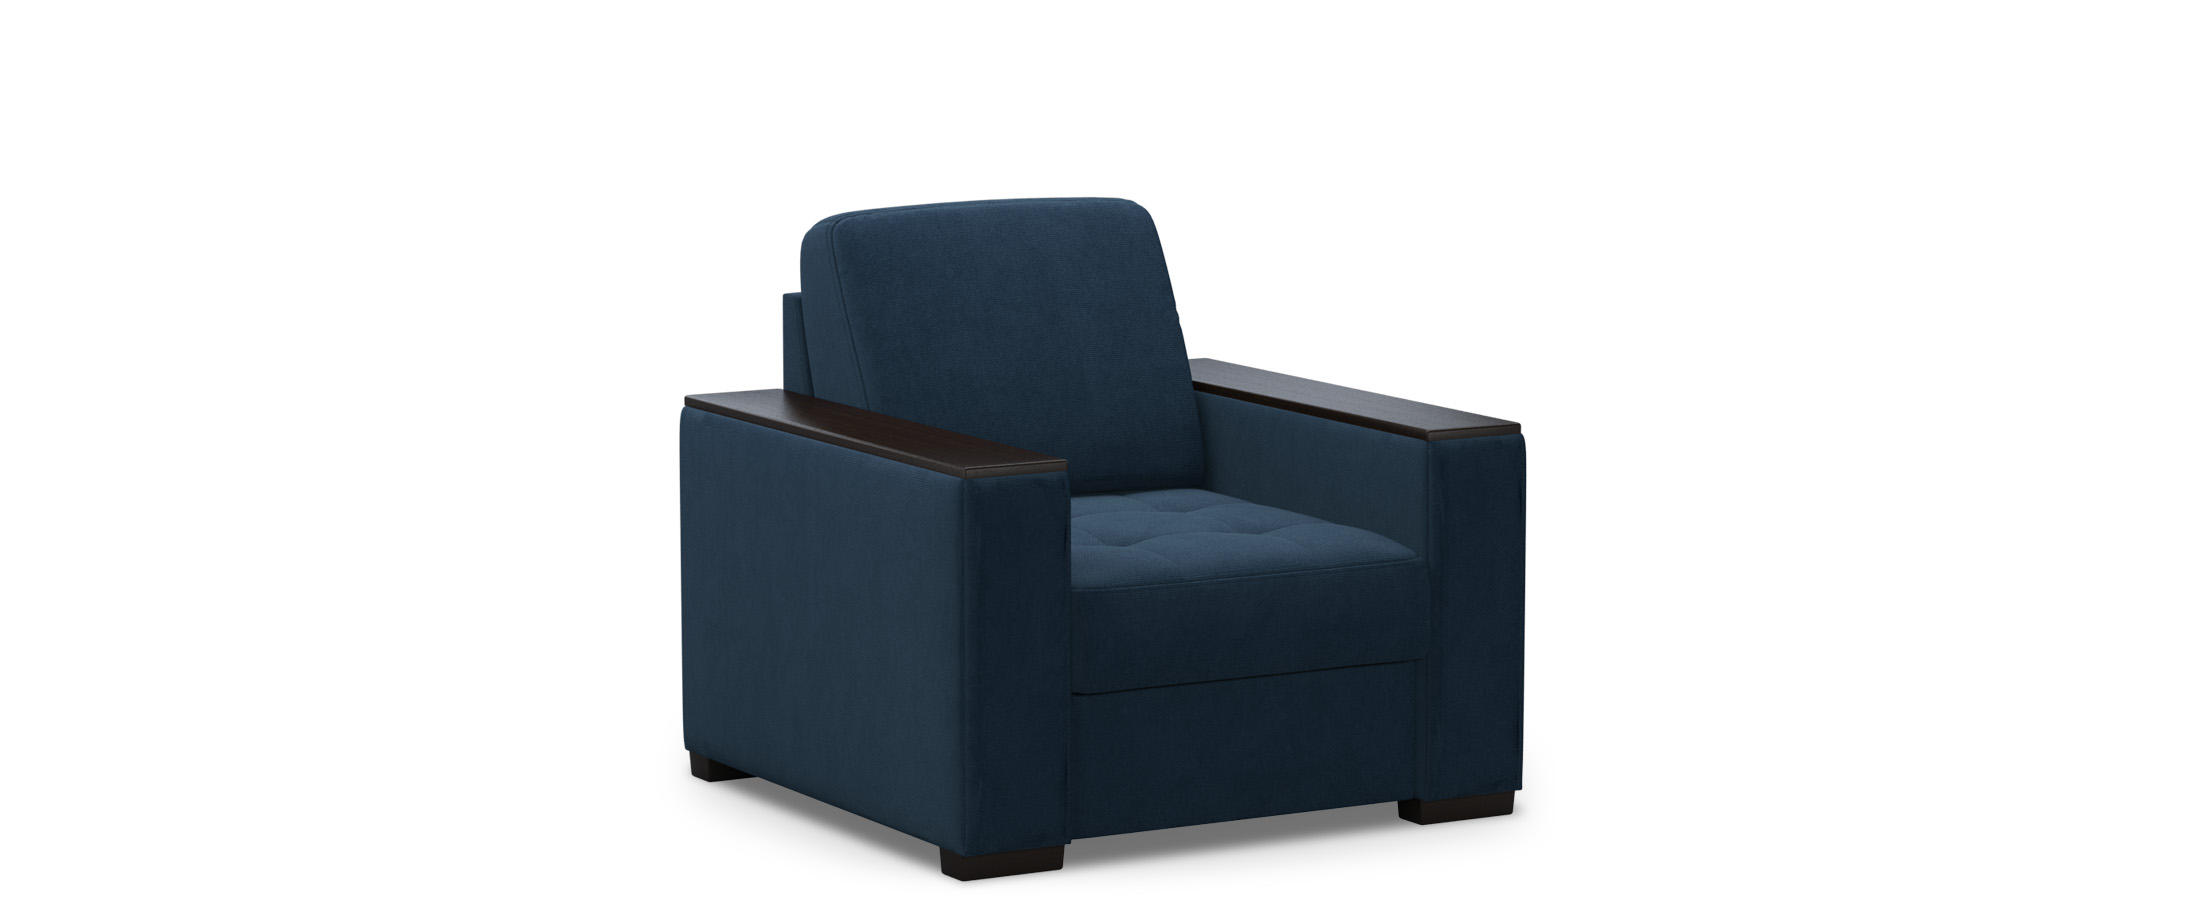 Кресло тканевое Милан 127 фото